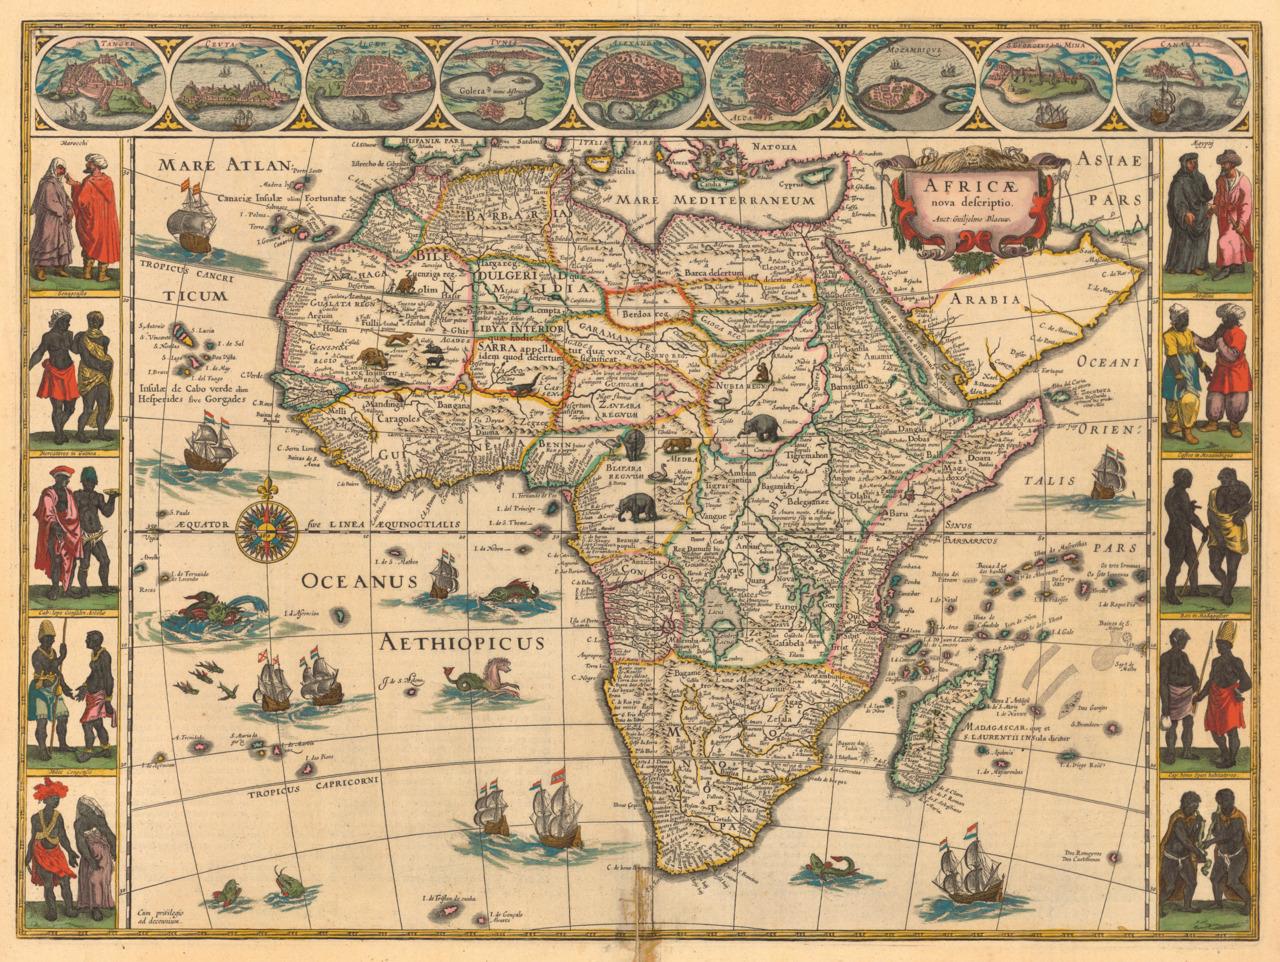 Hanlon Vade Early African Civilizations